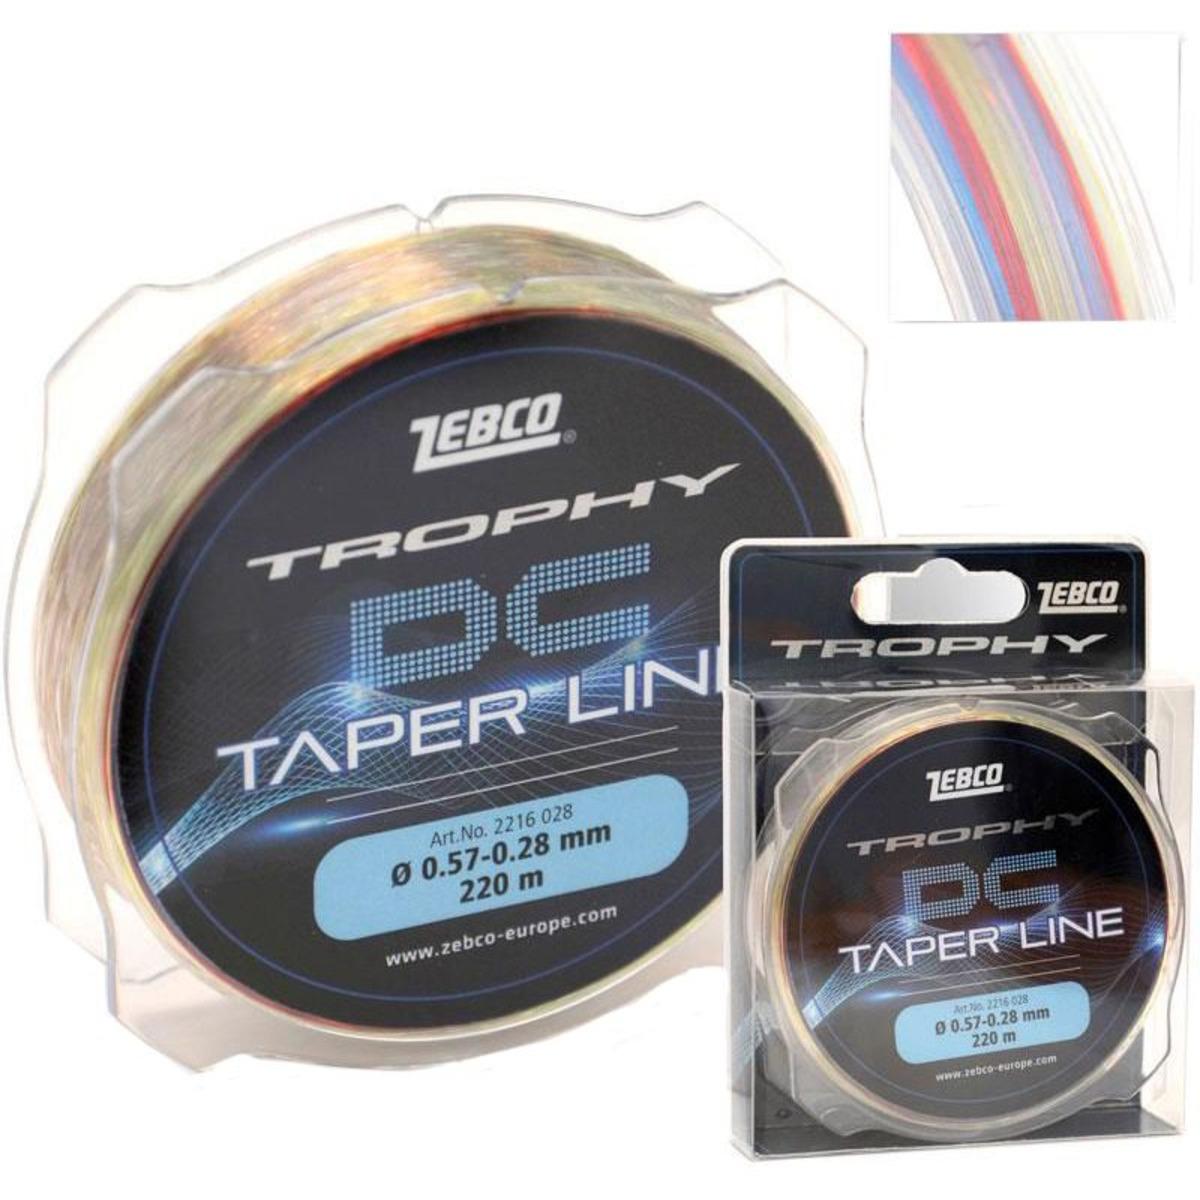 Zebco Trophy DC Taper Line - 0.28 mm - 0.57 mm - 220 m